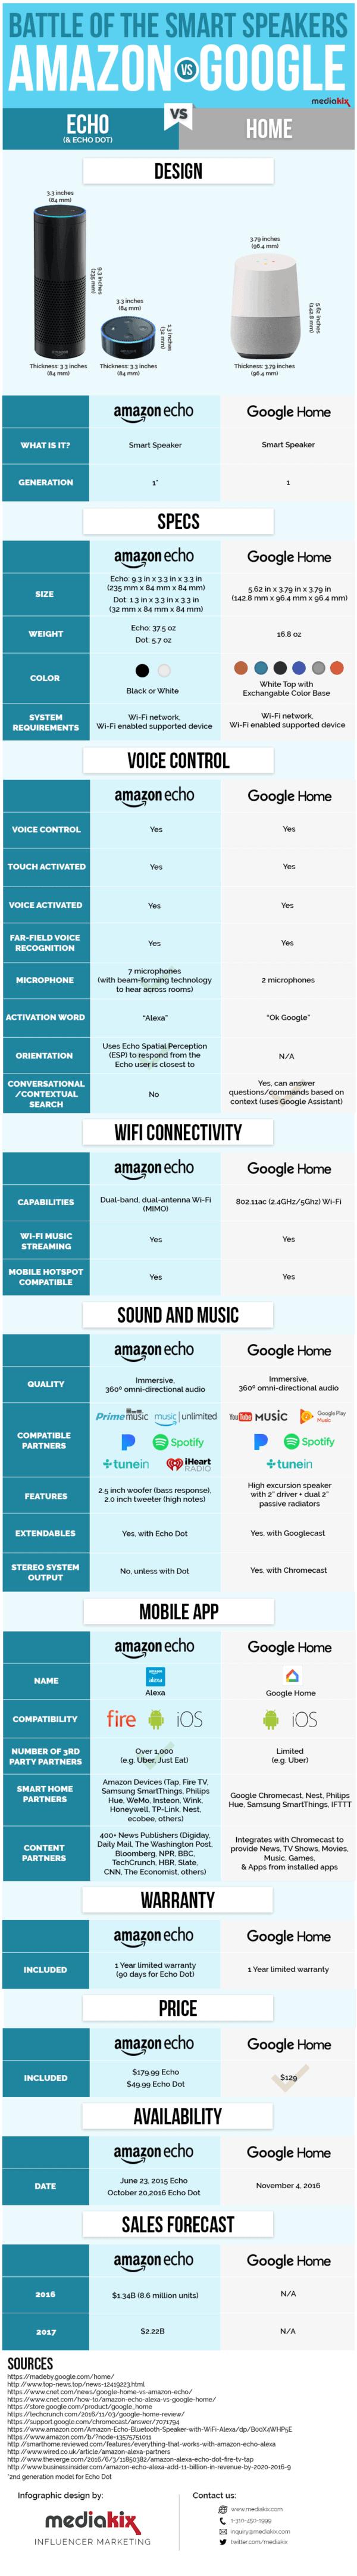 google-home-vs-amazon-echo-dot-smart-speaker-infographic-comparison